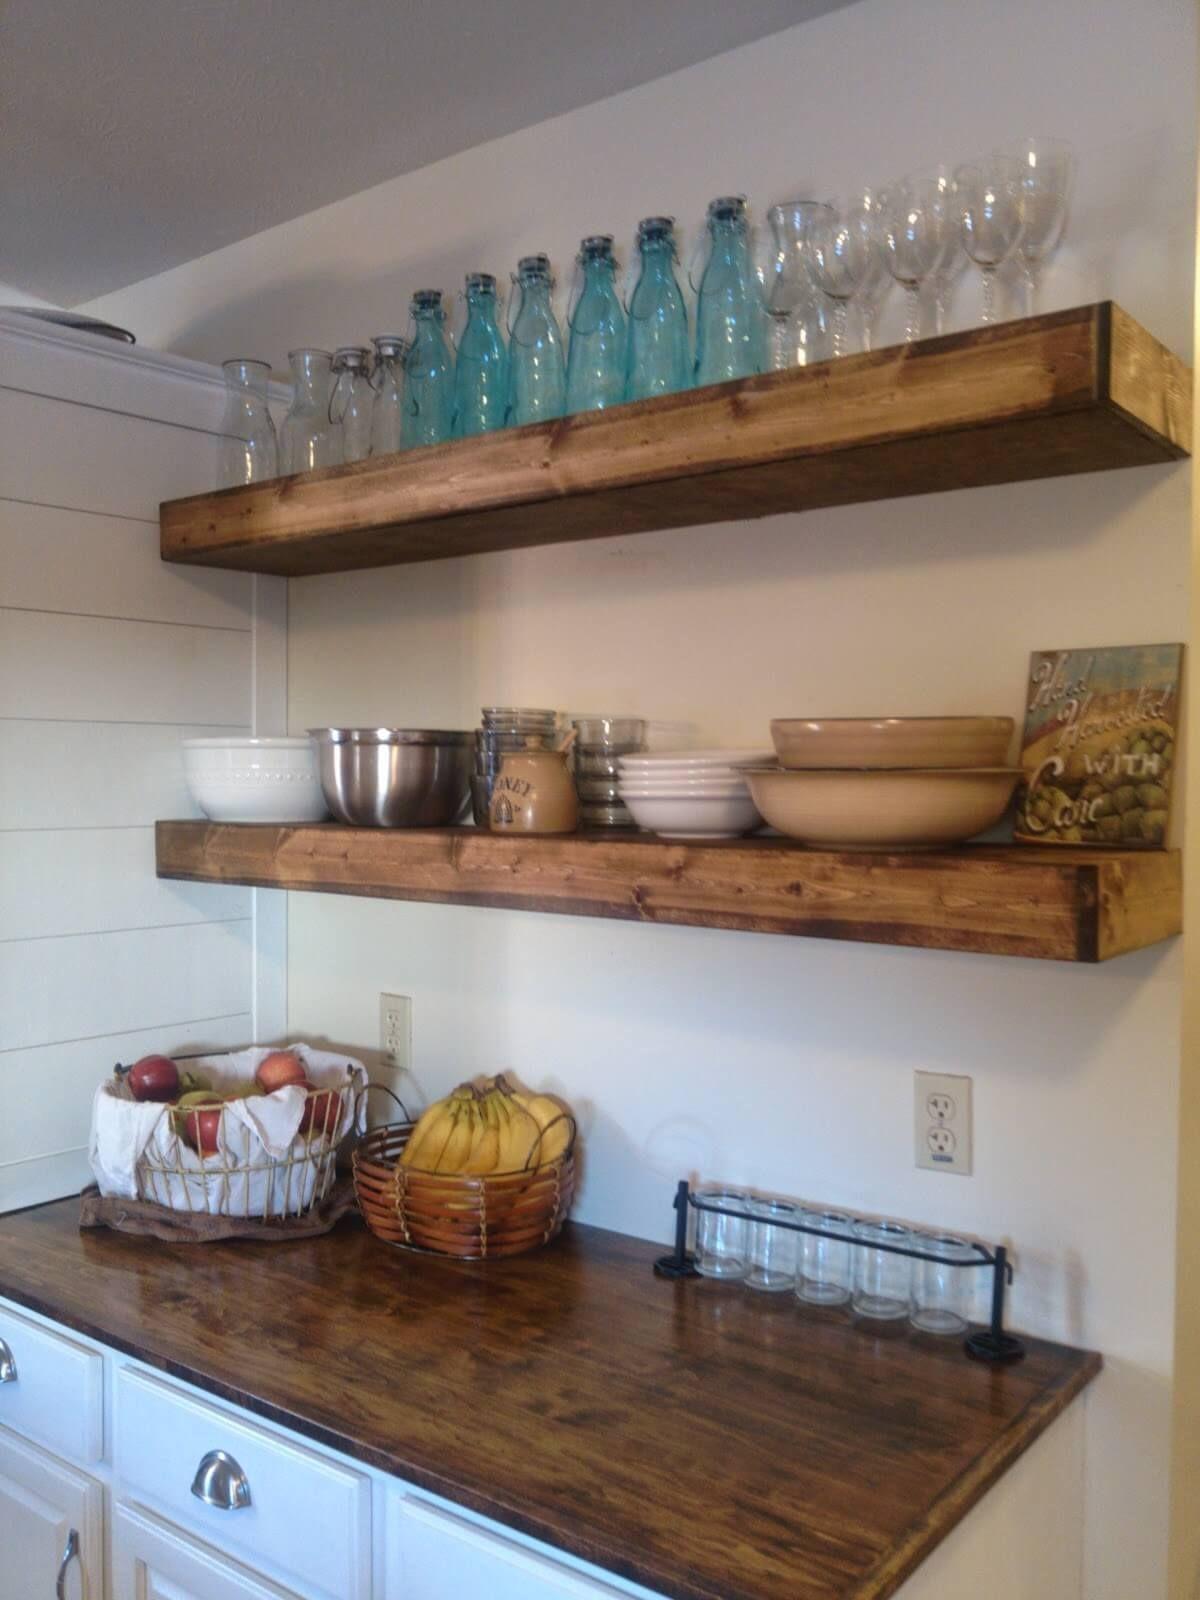 Heavy Duty Floating Kitchen Shelves Rak Ikea Hacks